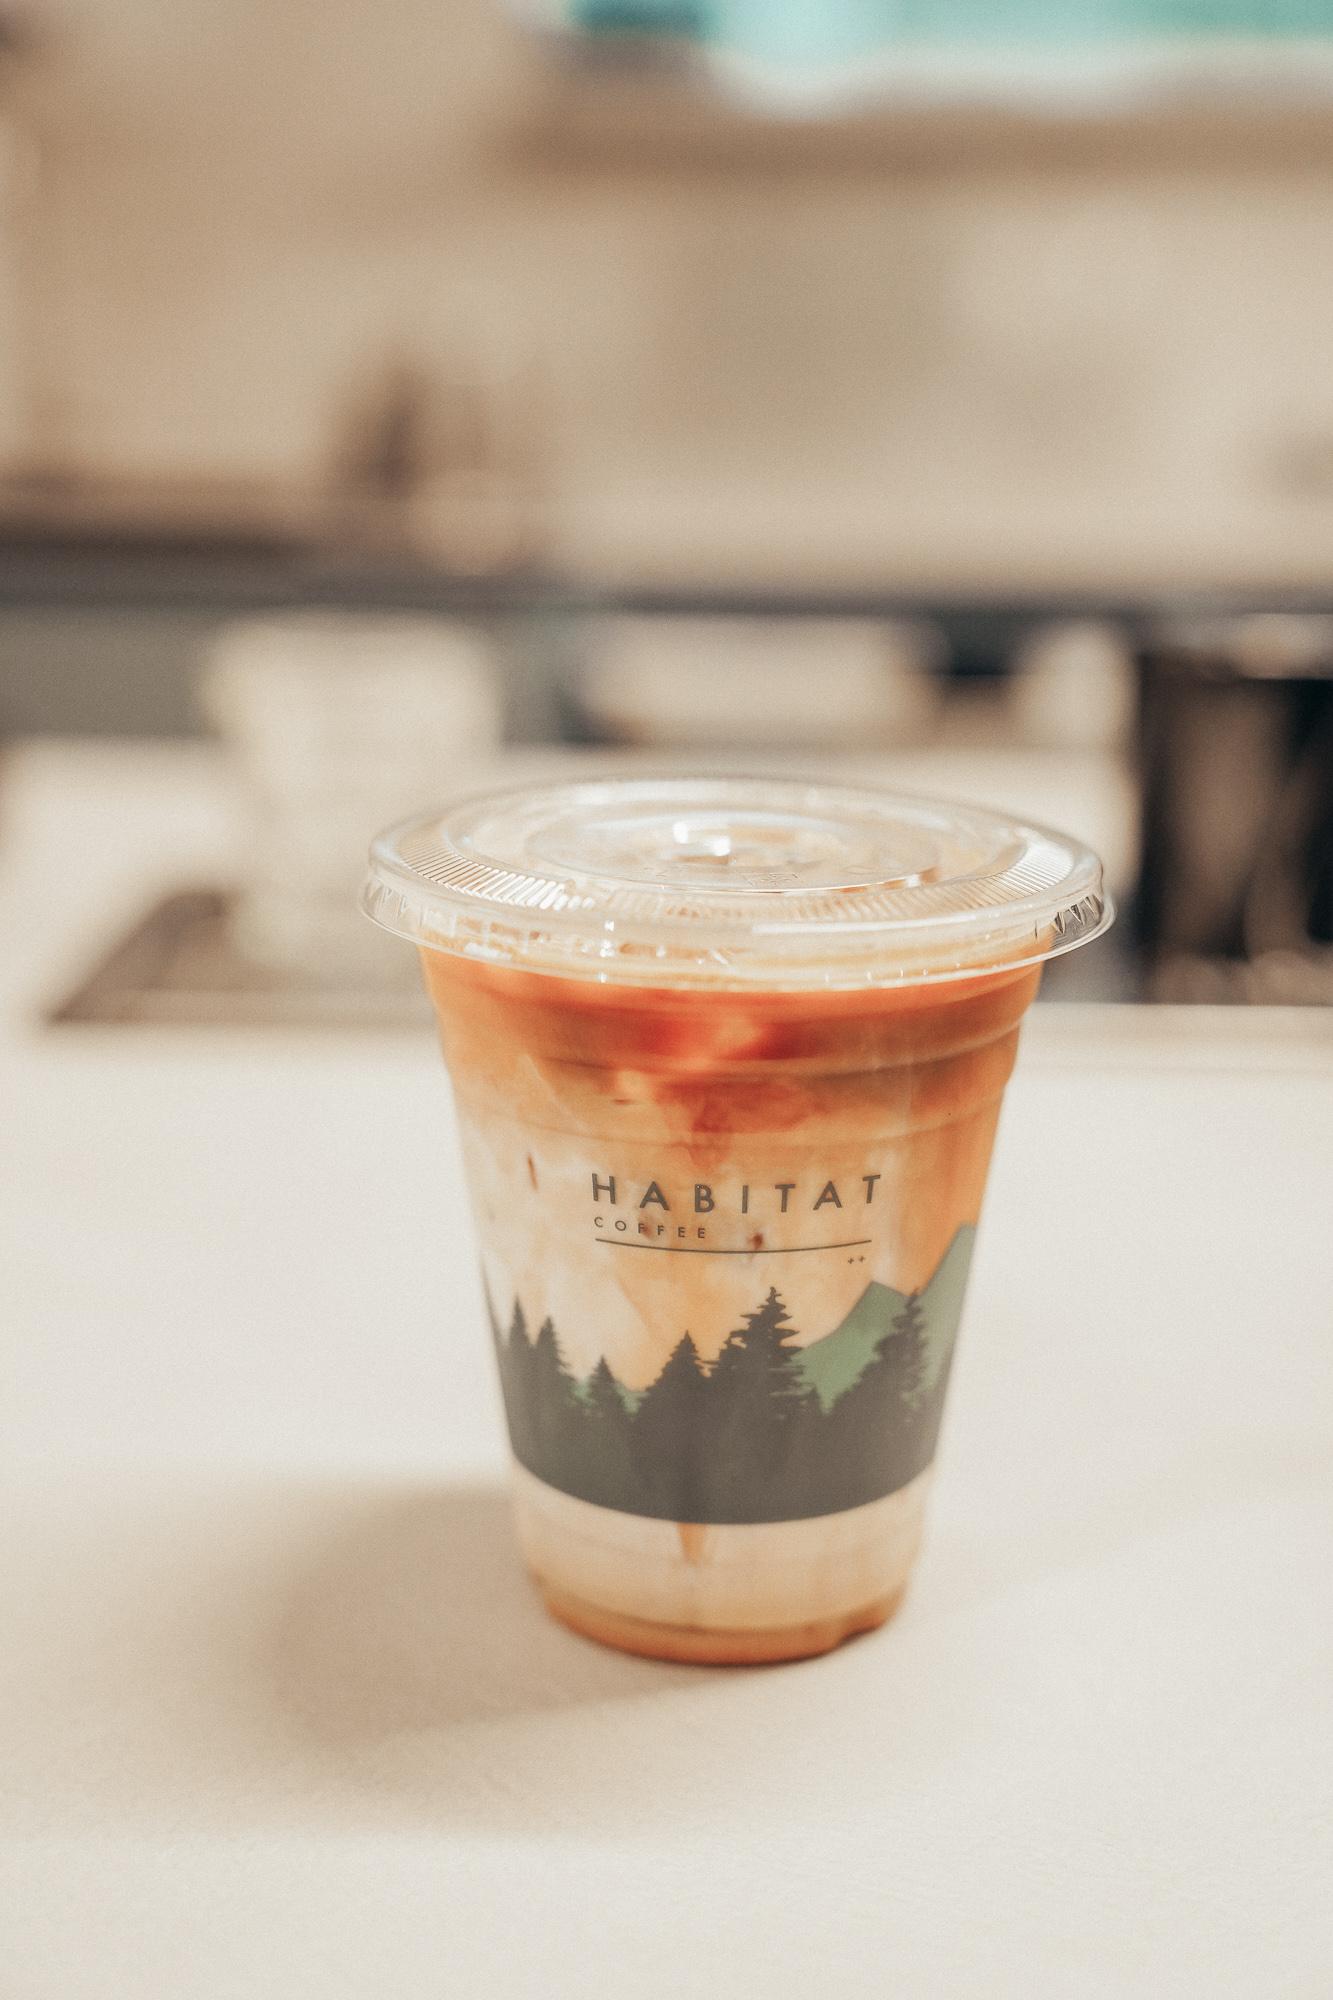 Habitat Coffee Iced White